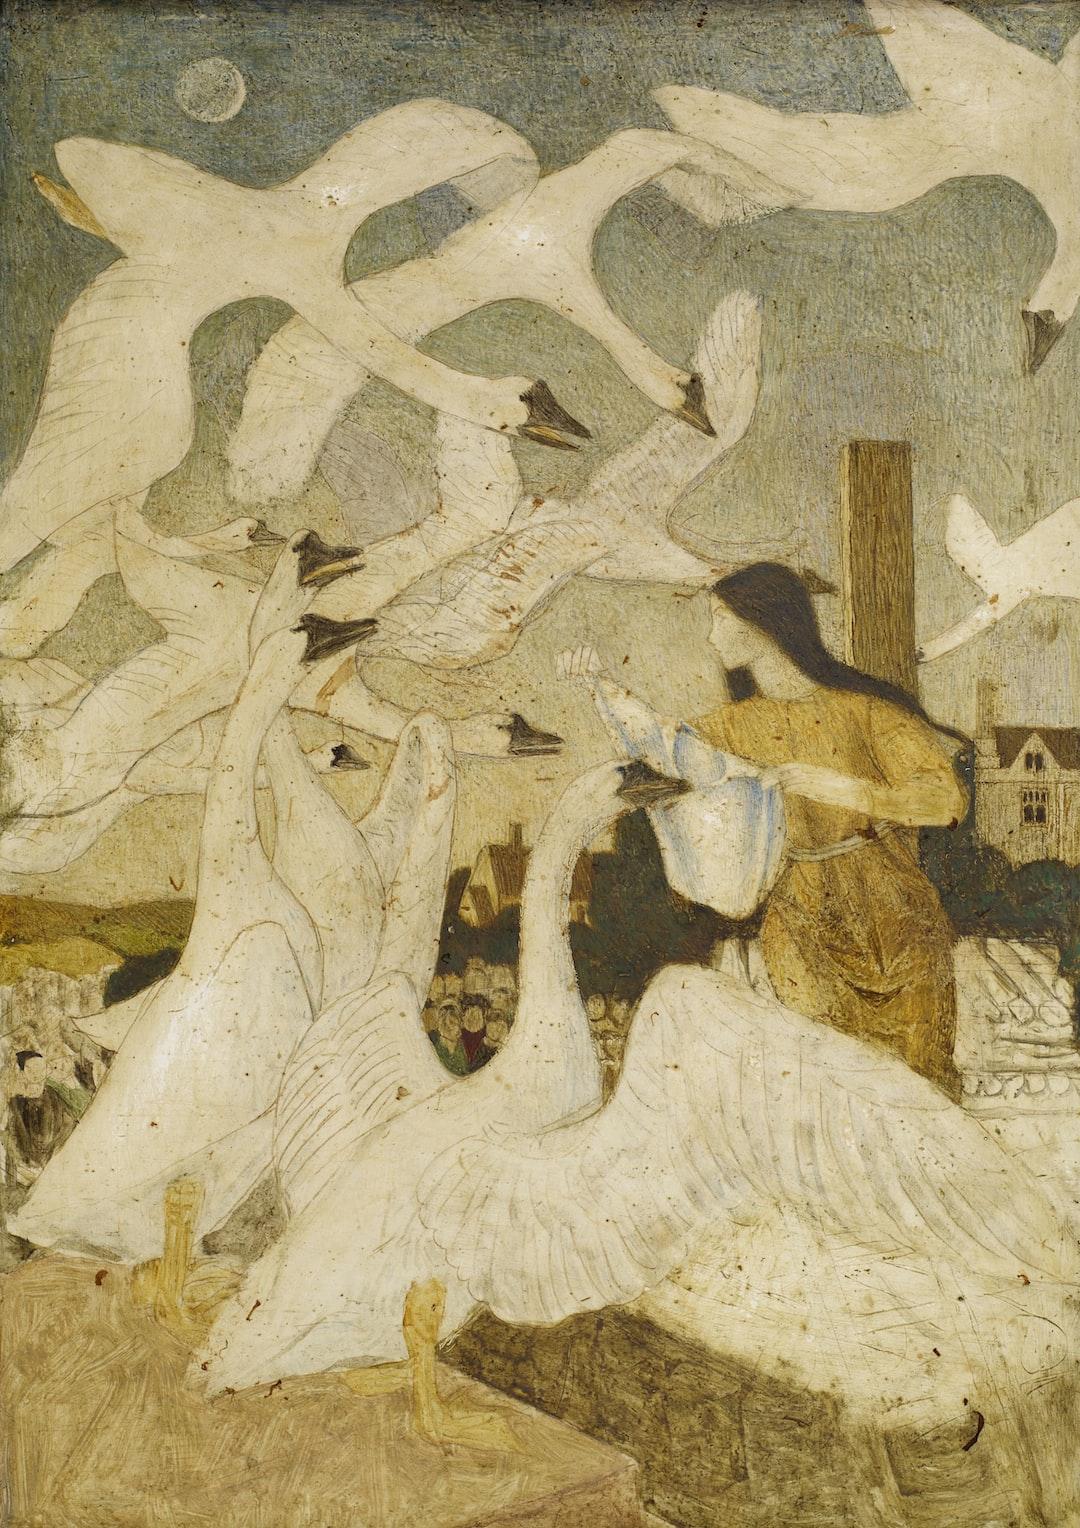 The Wild Swans (The Twelve Brothers Turned Into Swans), 1928 Arthur Joseph Gaskin